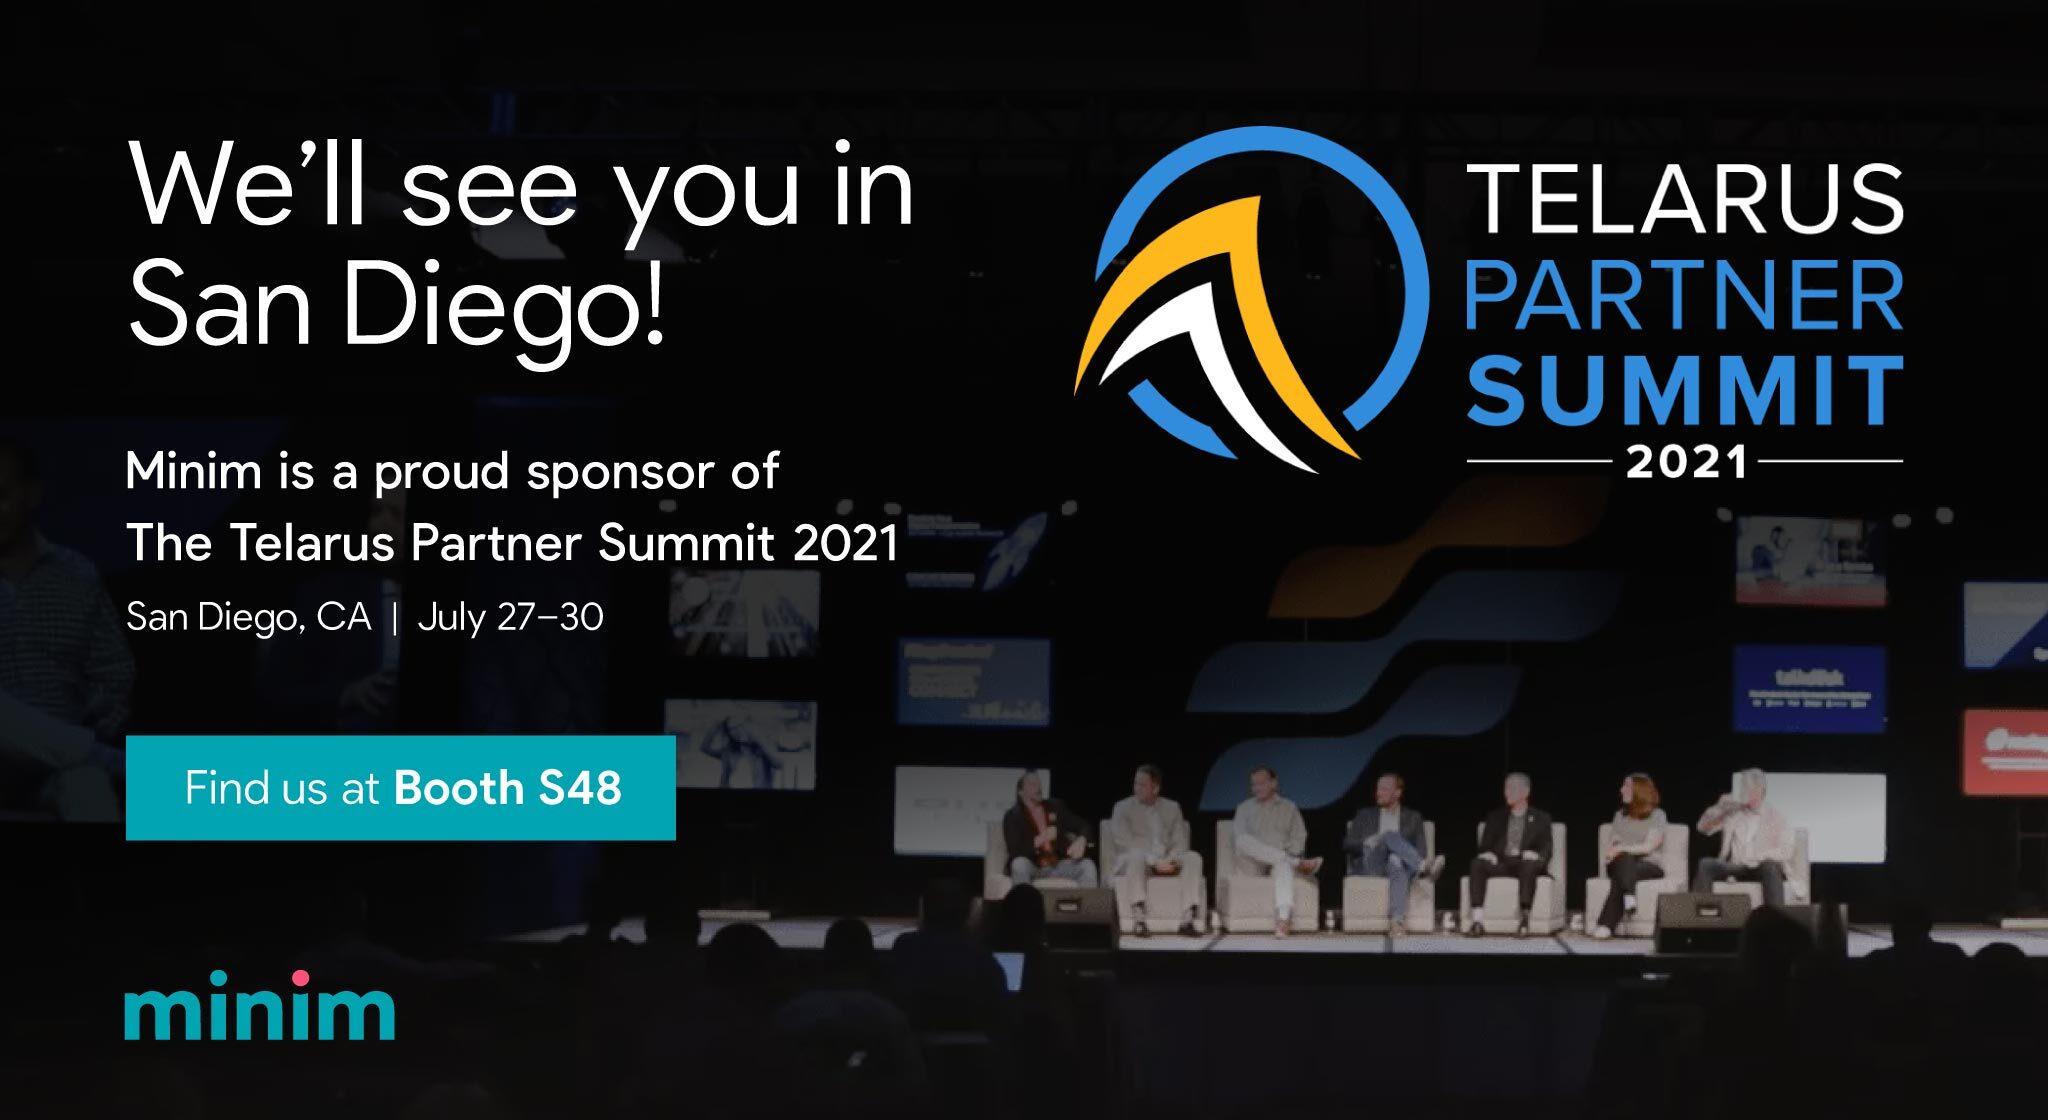 "<img src=""telarus-partner-summit-san-diego-2021-minim-and-telarus-logo.jpeg."" alt=""building-a-secure-hybrid-work-model-minim-presents-remote-technology-solutions-at-2021-telarus-partner-summit-san-diego-booth-S48"""">"